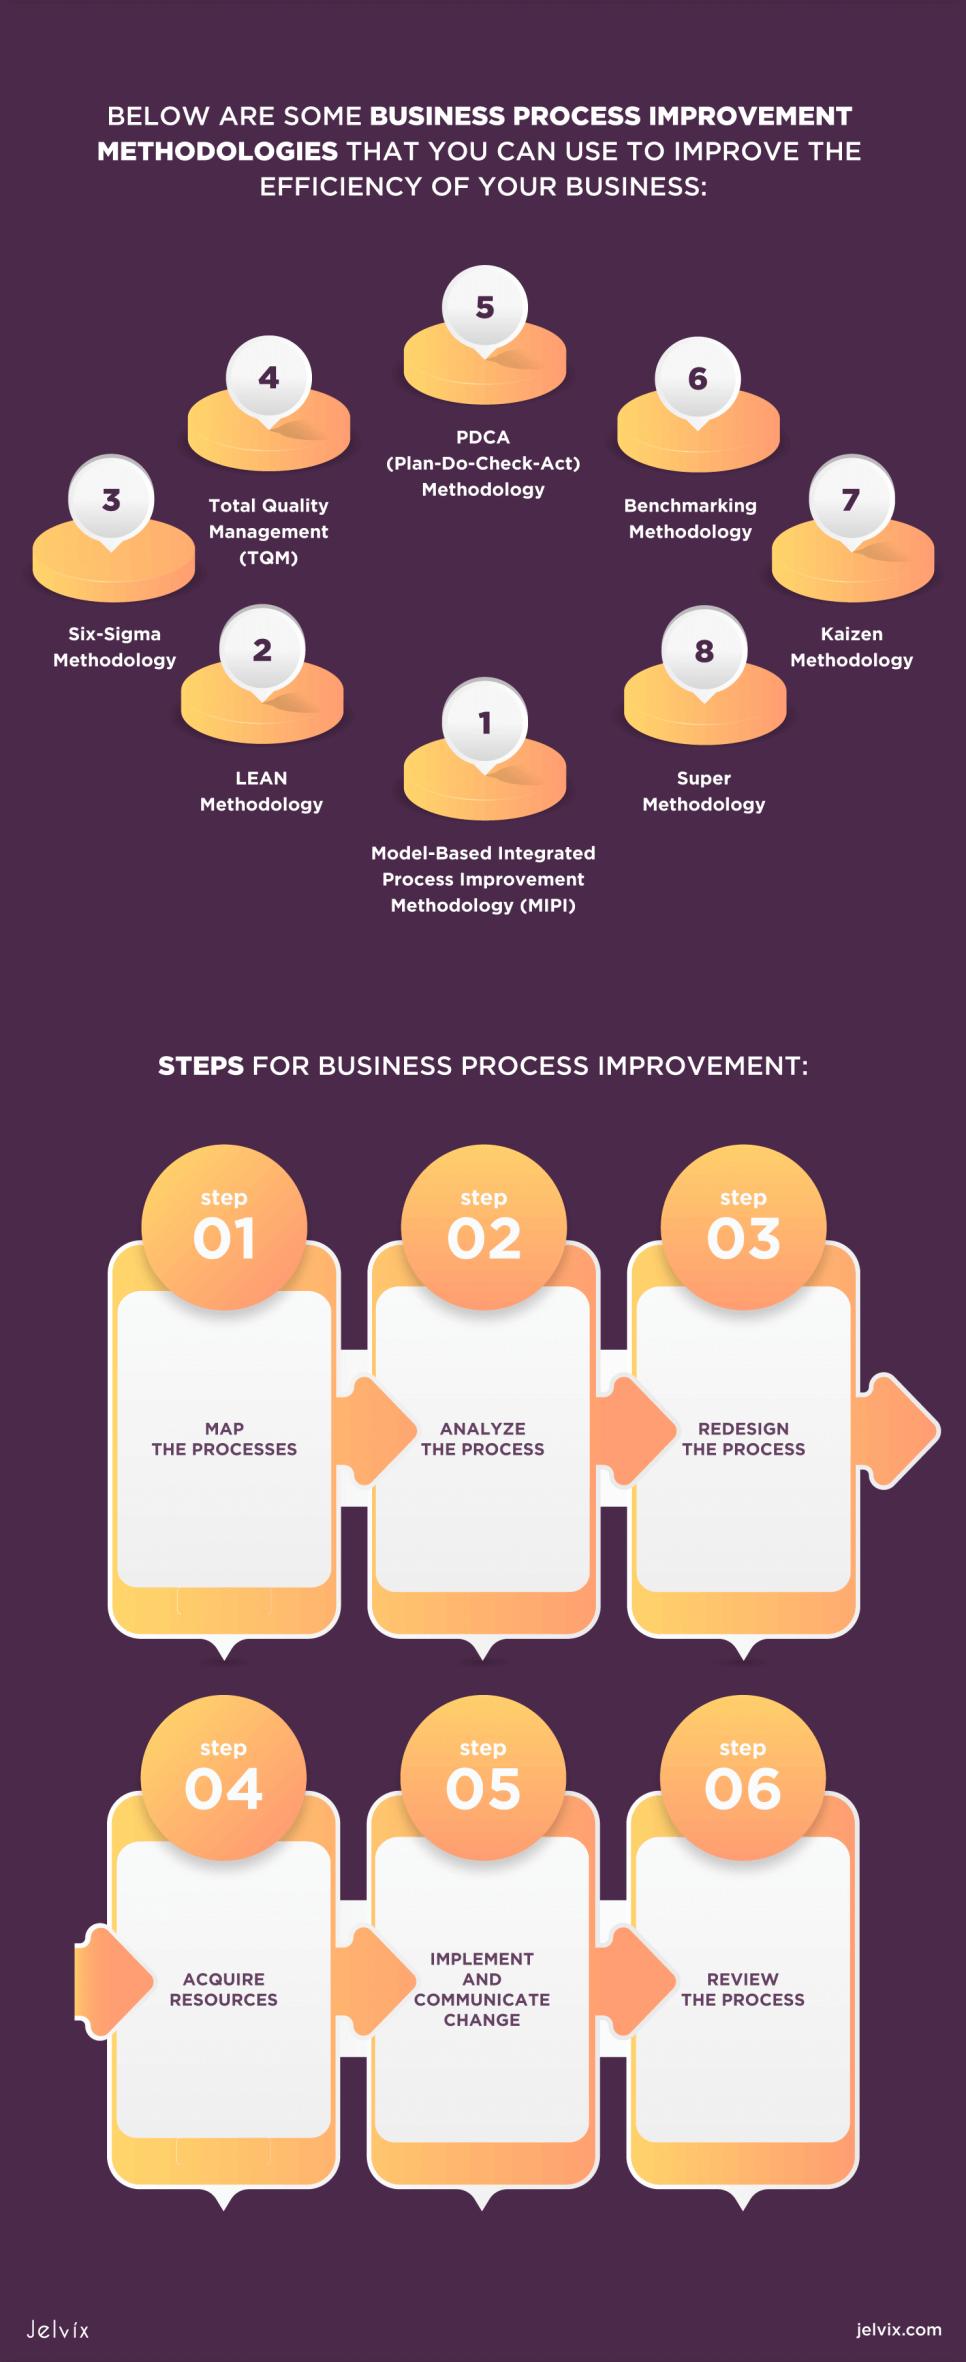 Business Process Improvement implementation